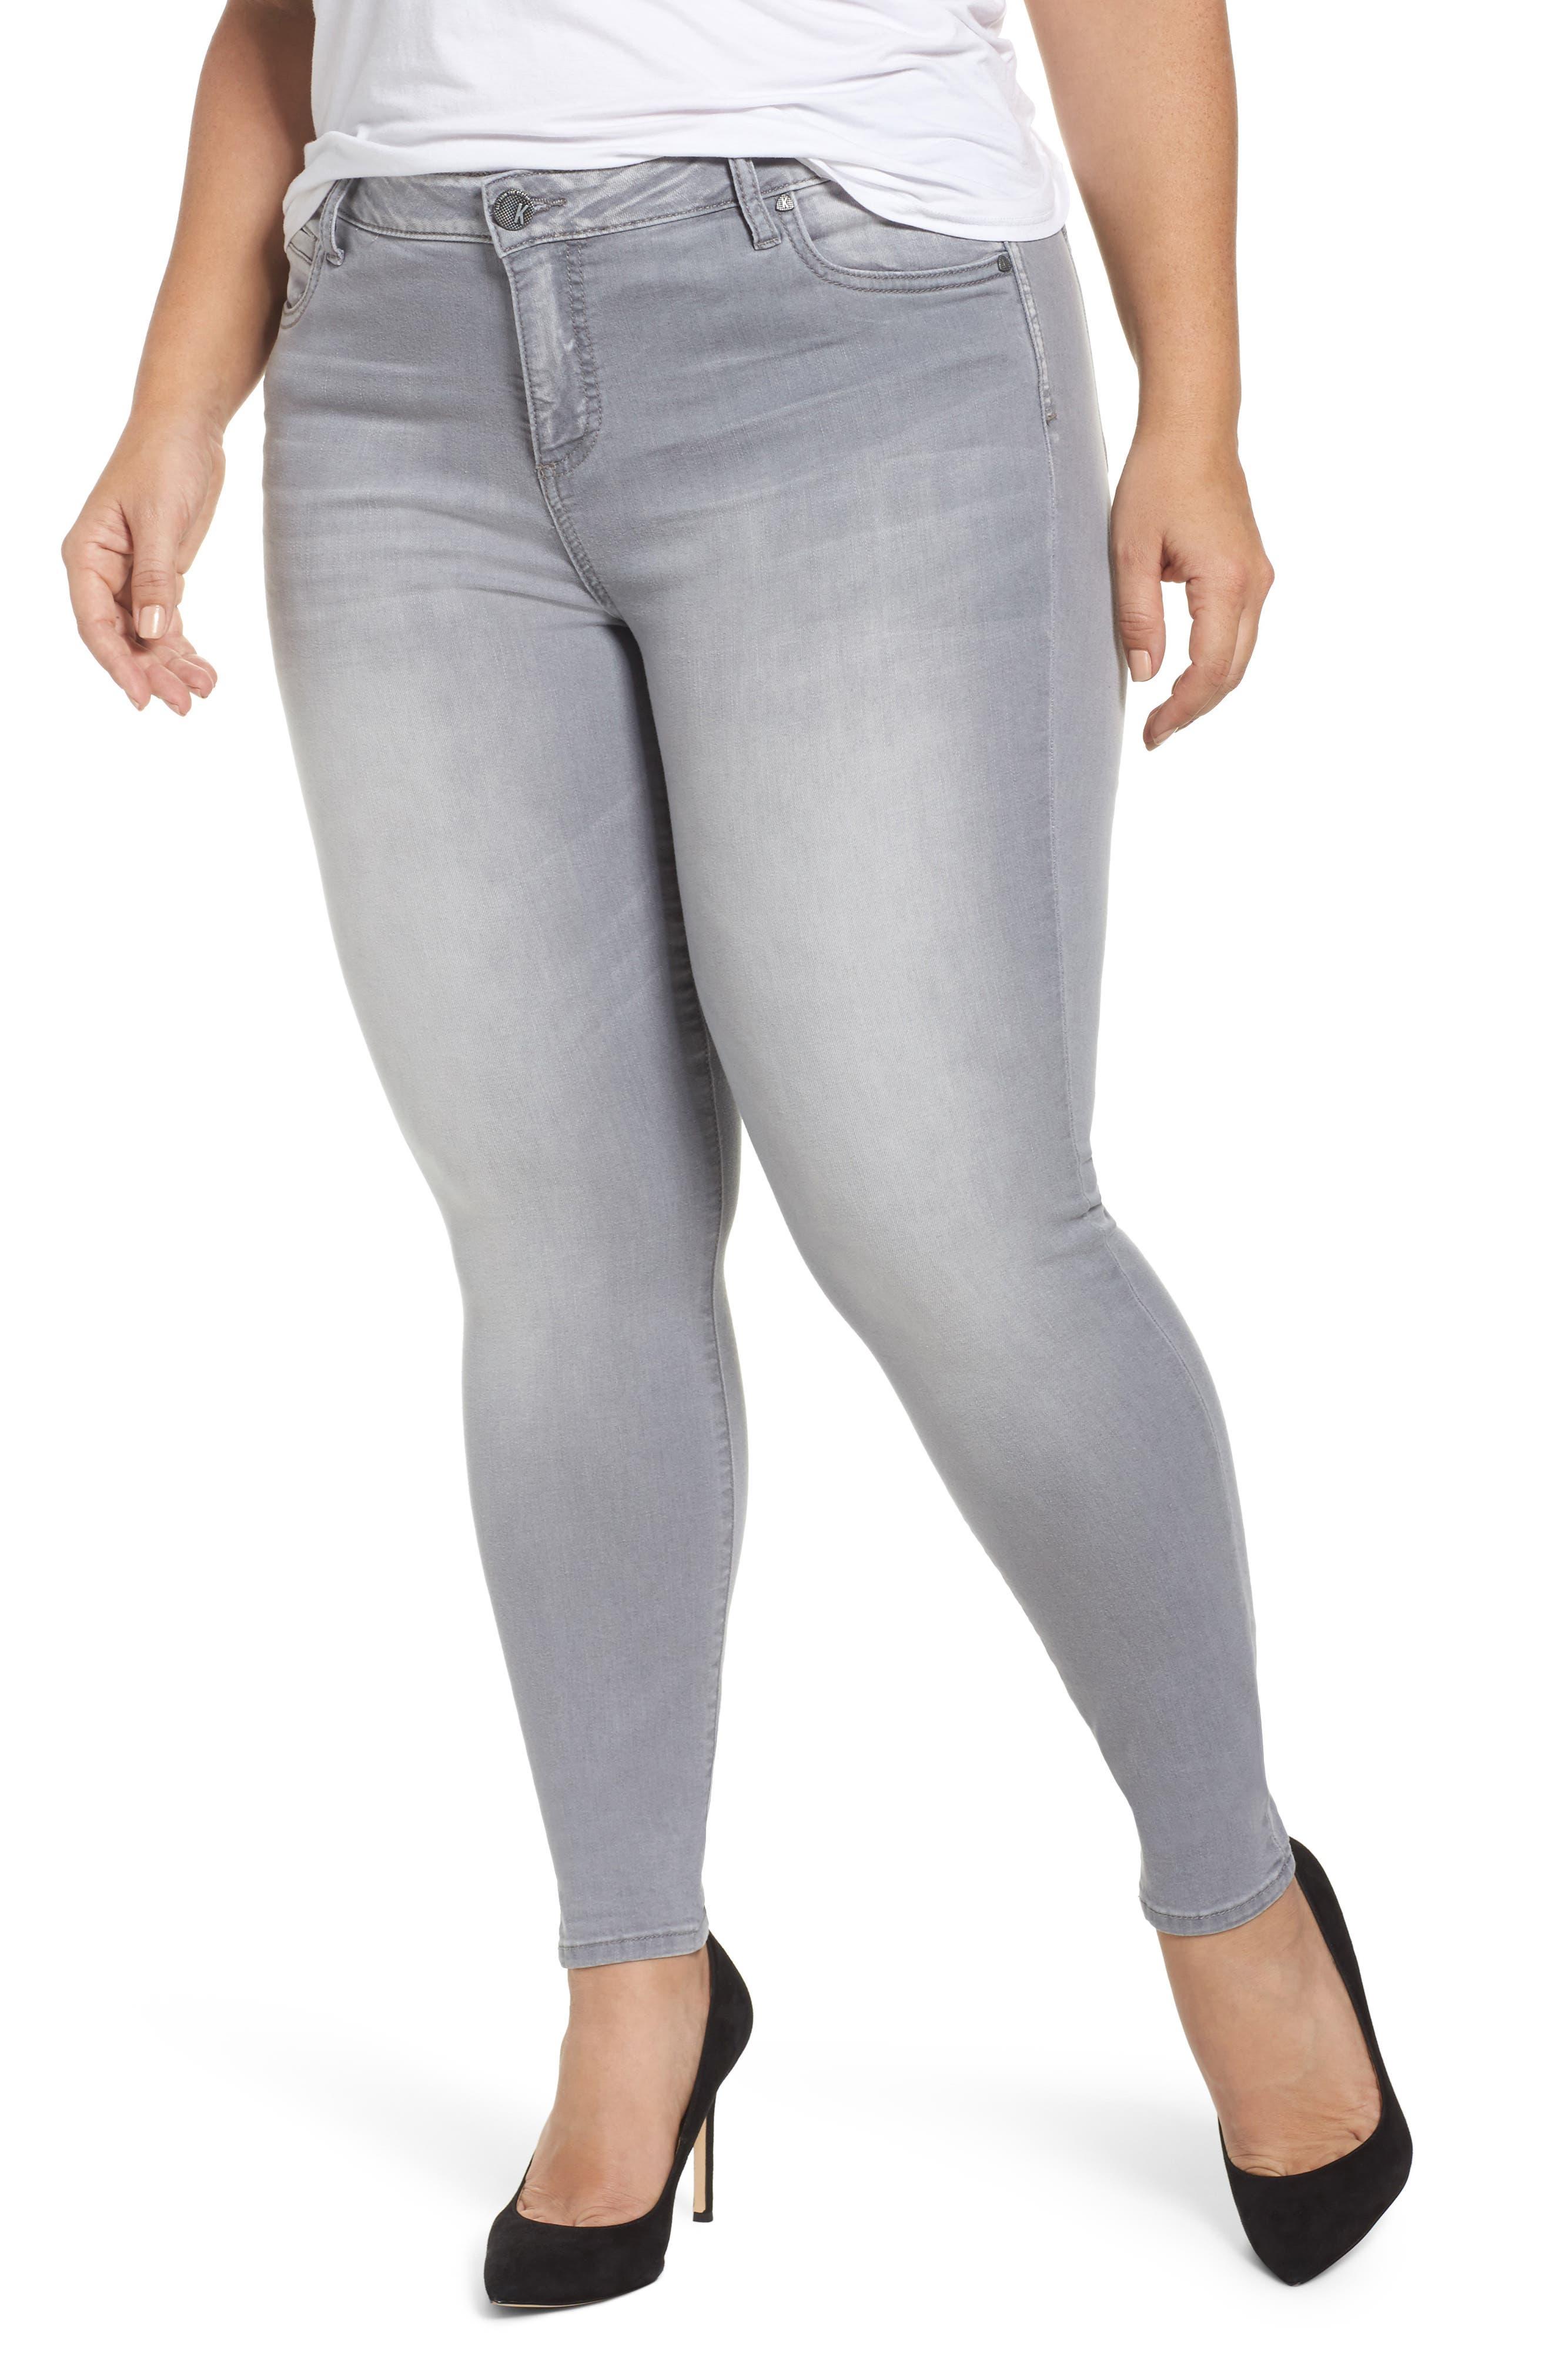 Plus Women's Kut From The Kloth Mia Skinny Jeans